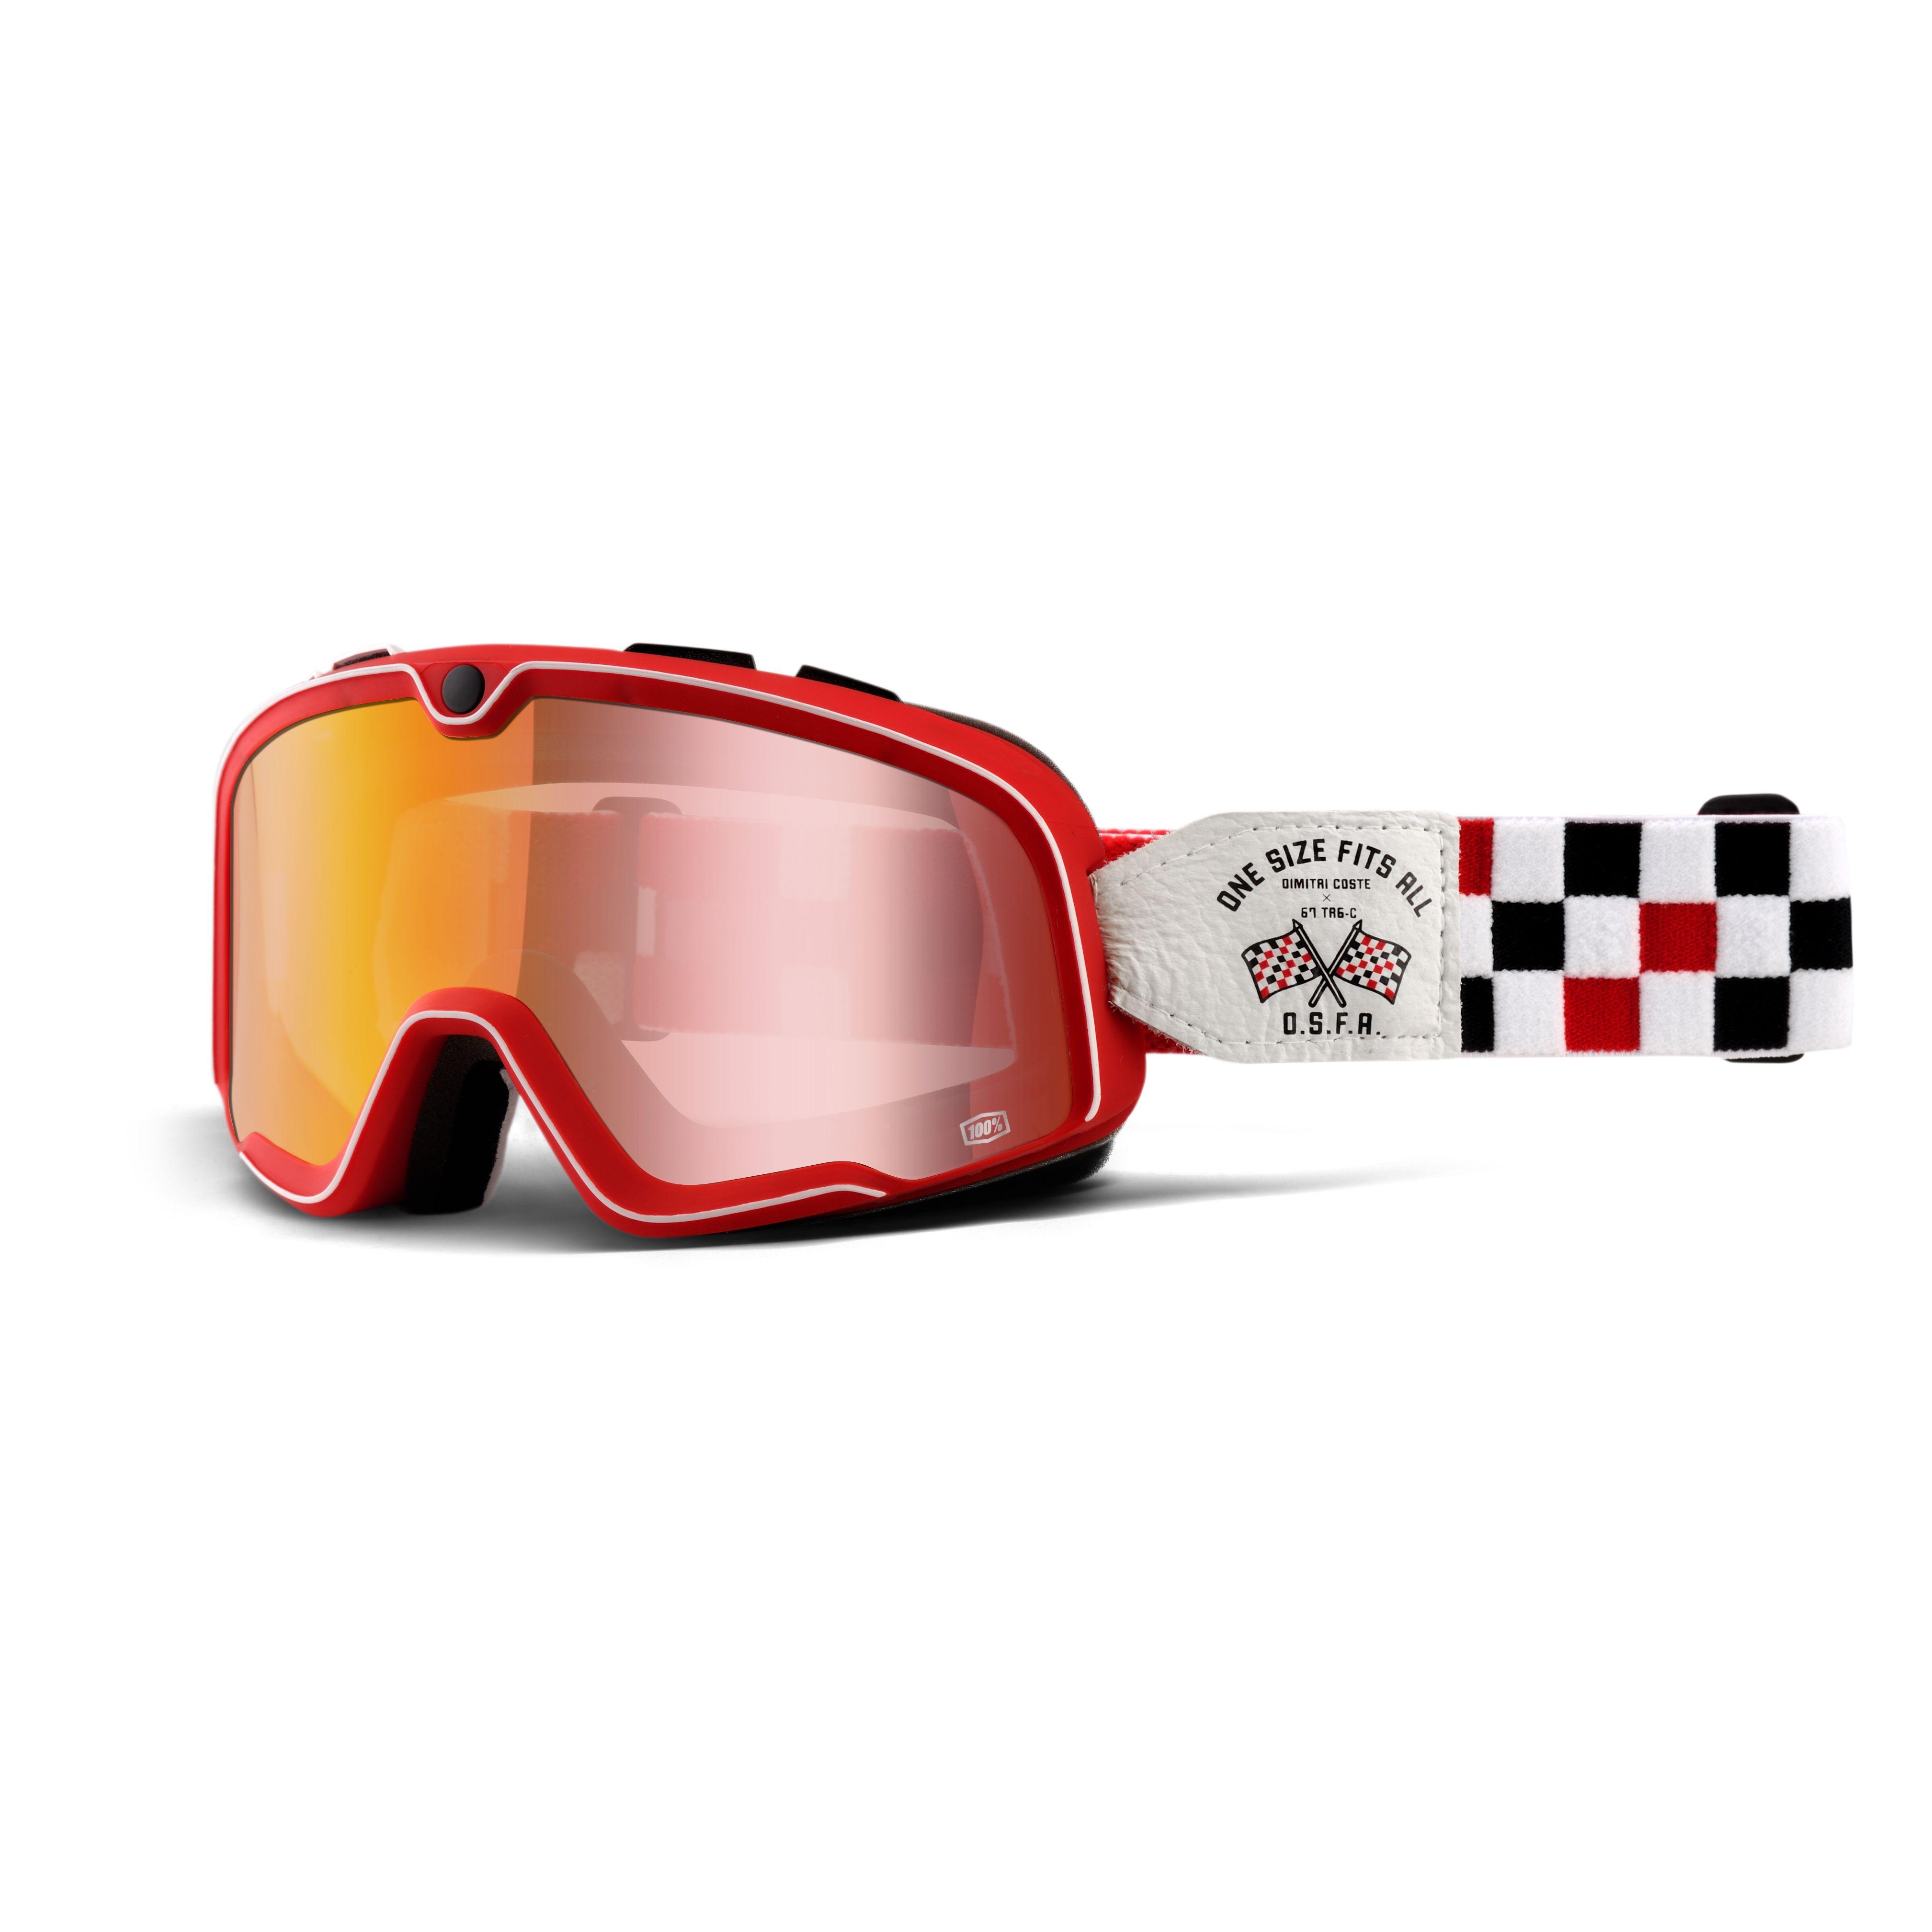 lunettes moto 100 barstow osfa 2 ecran rouge enduro. Black Bedroom Furniture Sets. Home Design Ideas